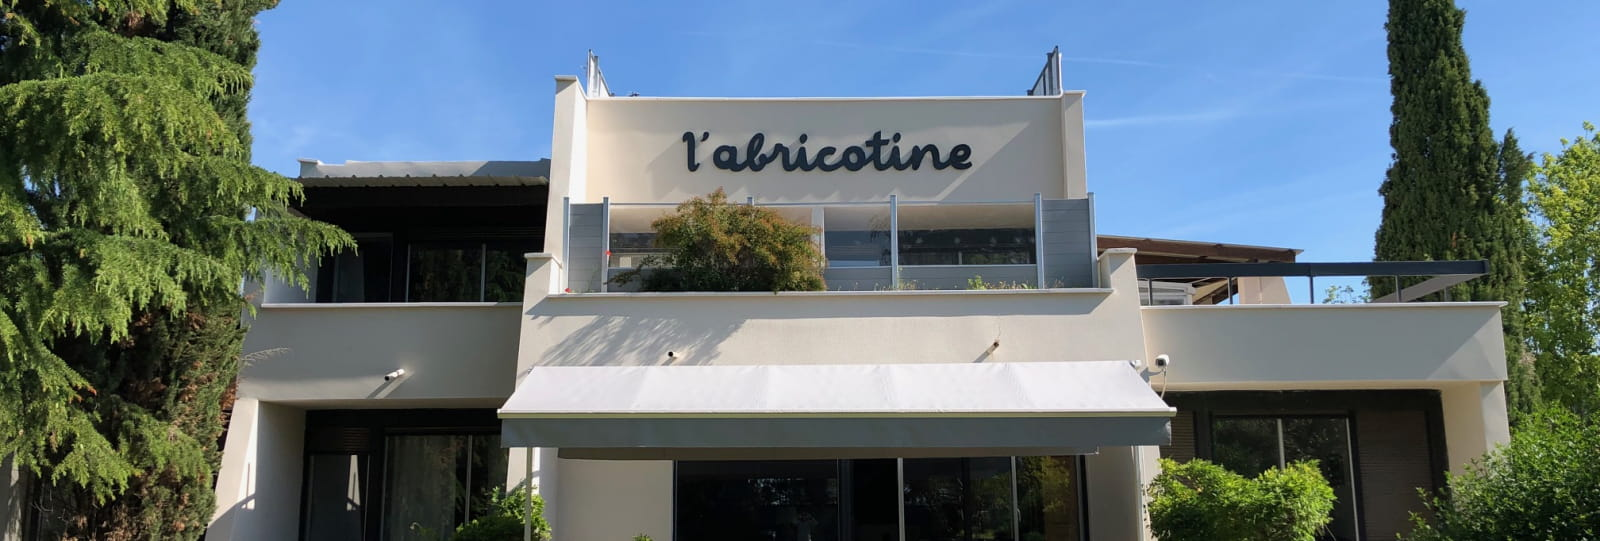 Hôtel l'Abricotine